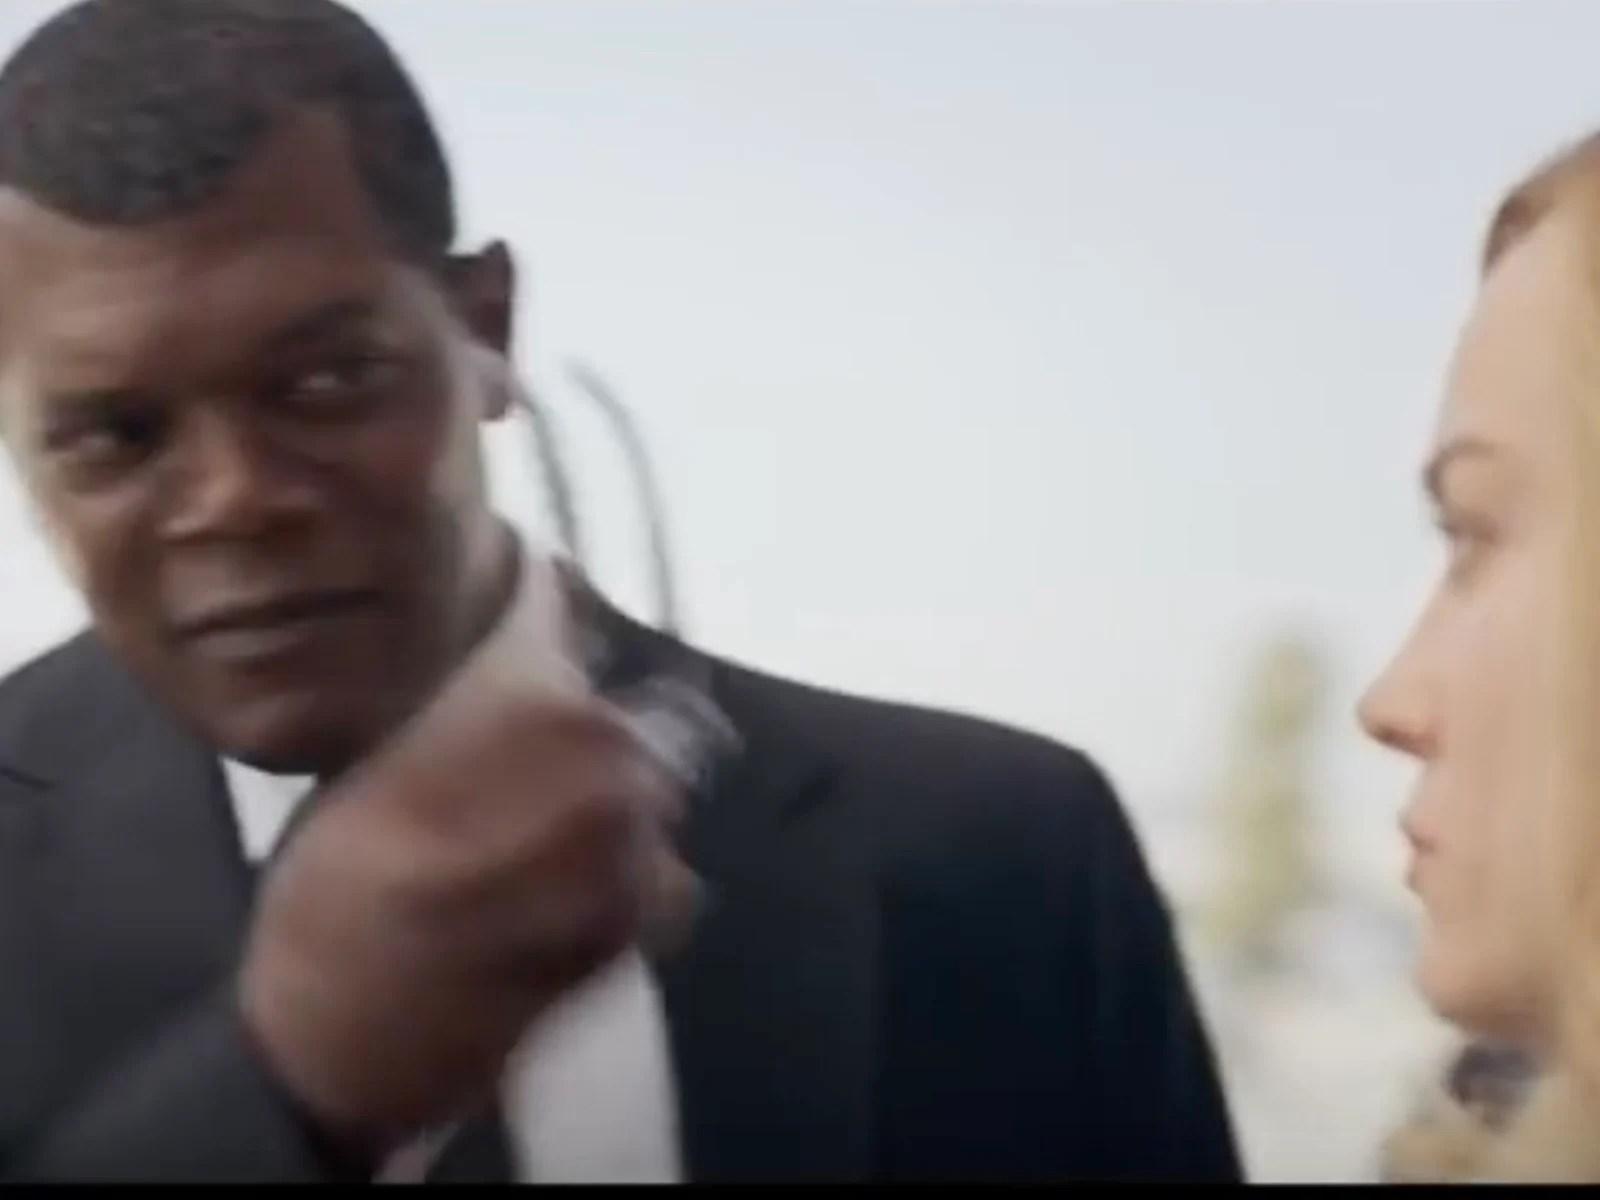 Watch Captain Marvel Trailer Delivers Big Clues Into Next